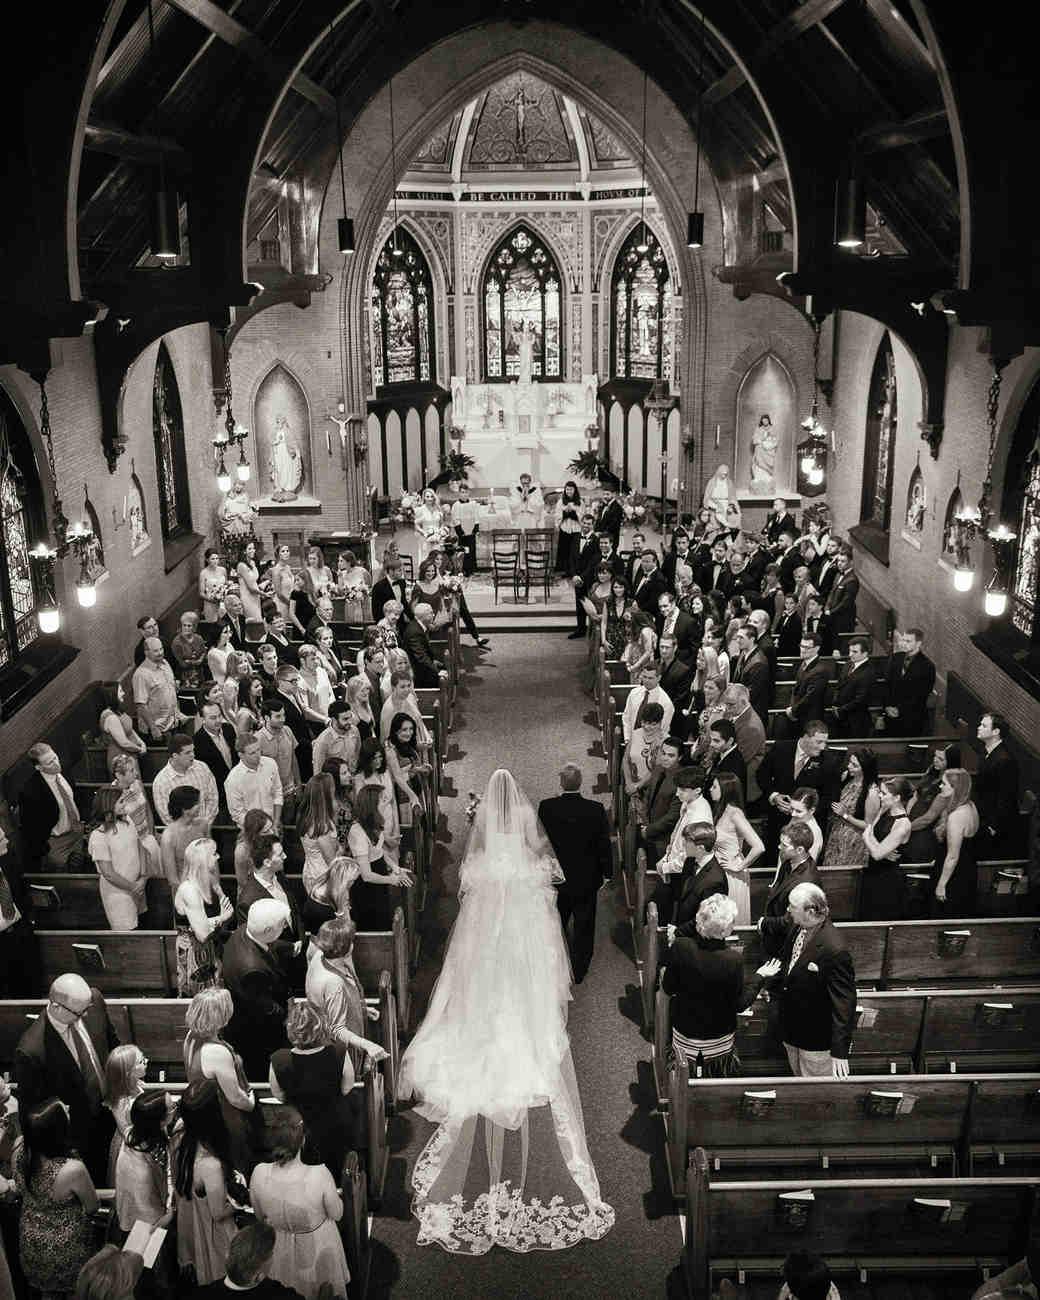 kaitlyn-robert-wedding-church-ceremony-0068-s112718-0316.jpg